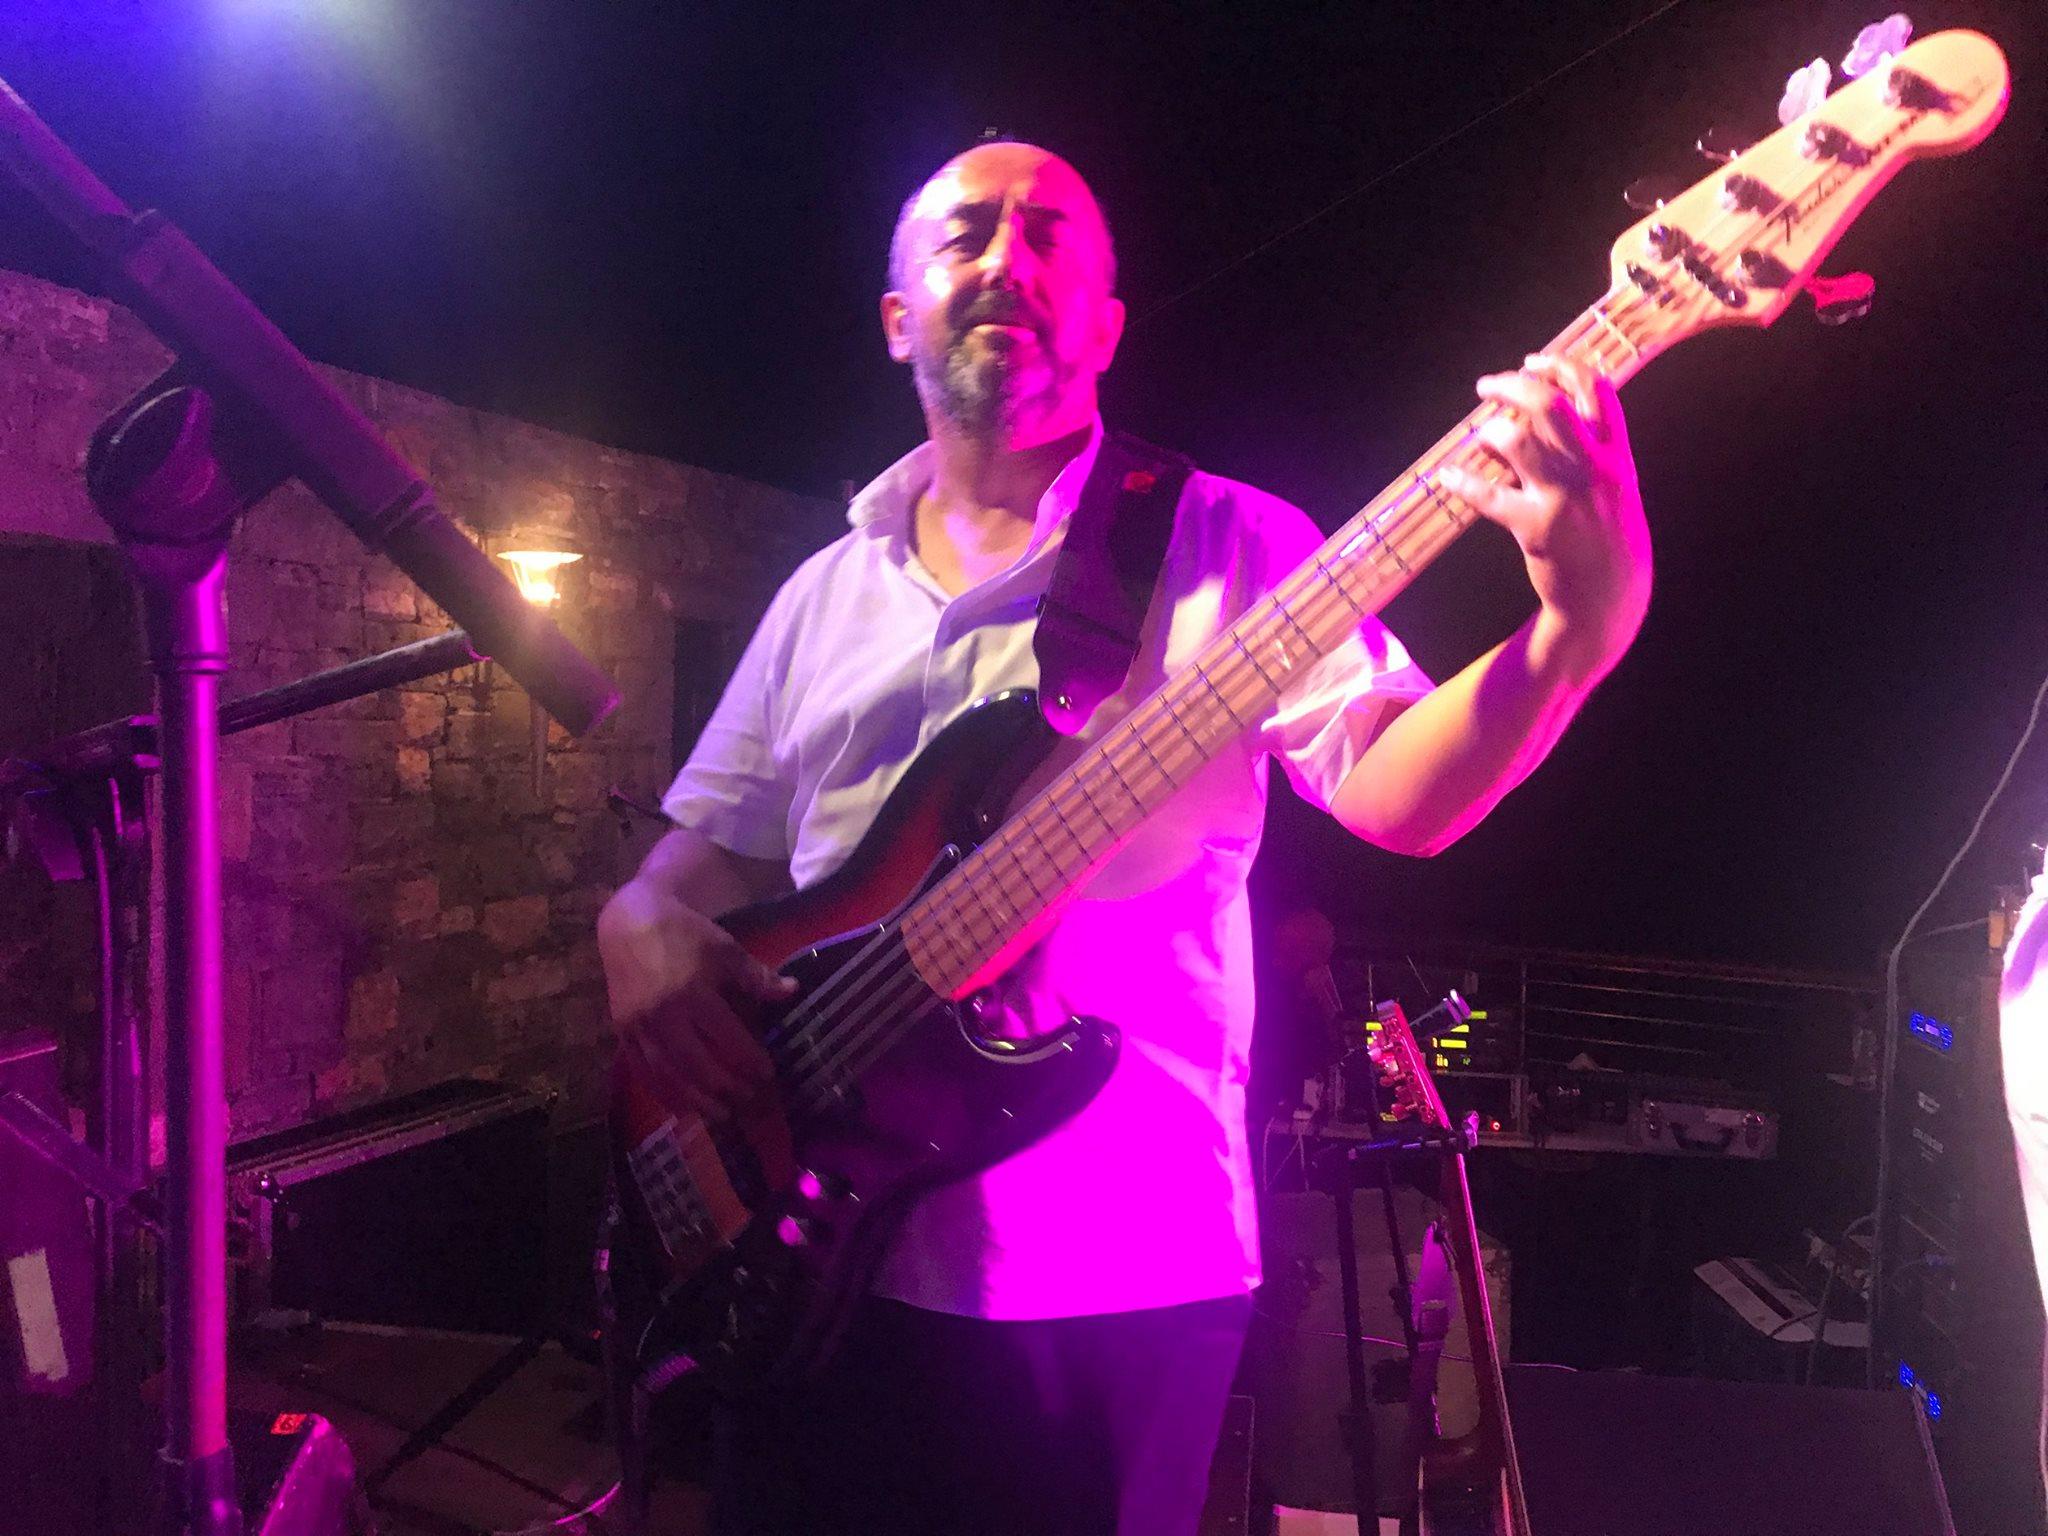 Eduart Halili - Bass